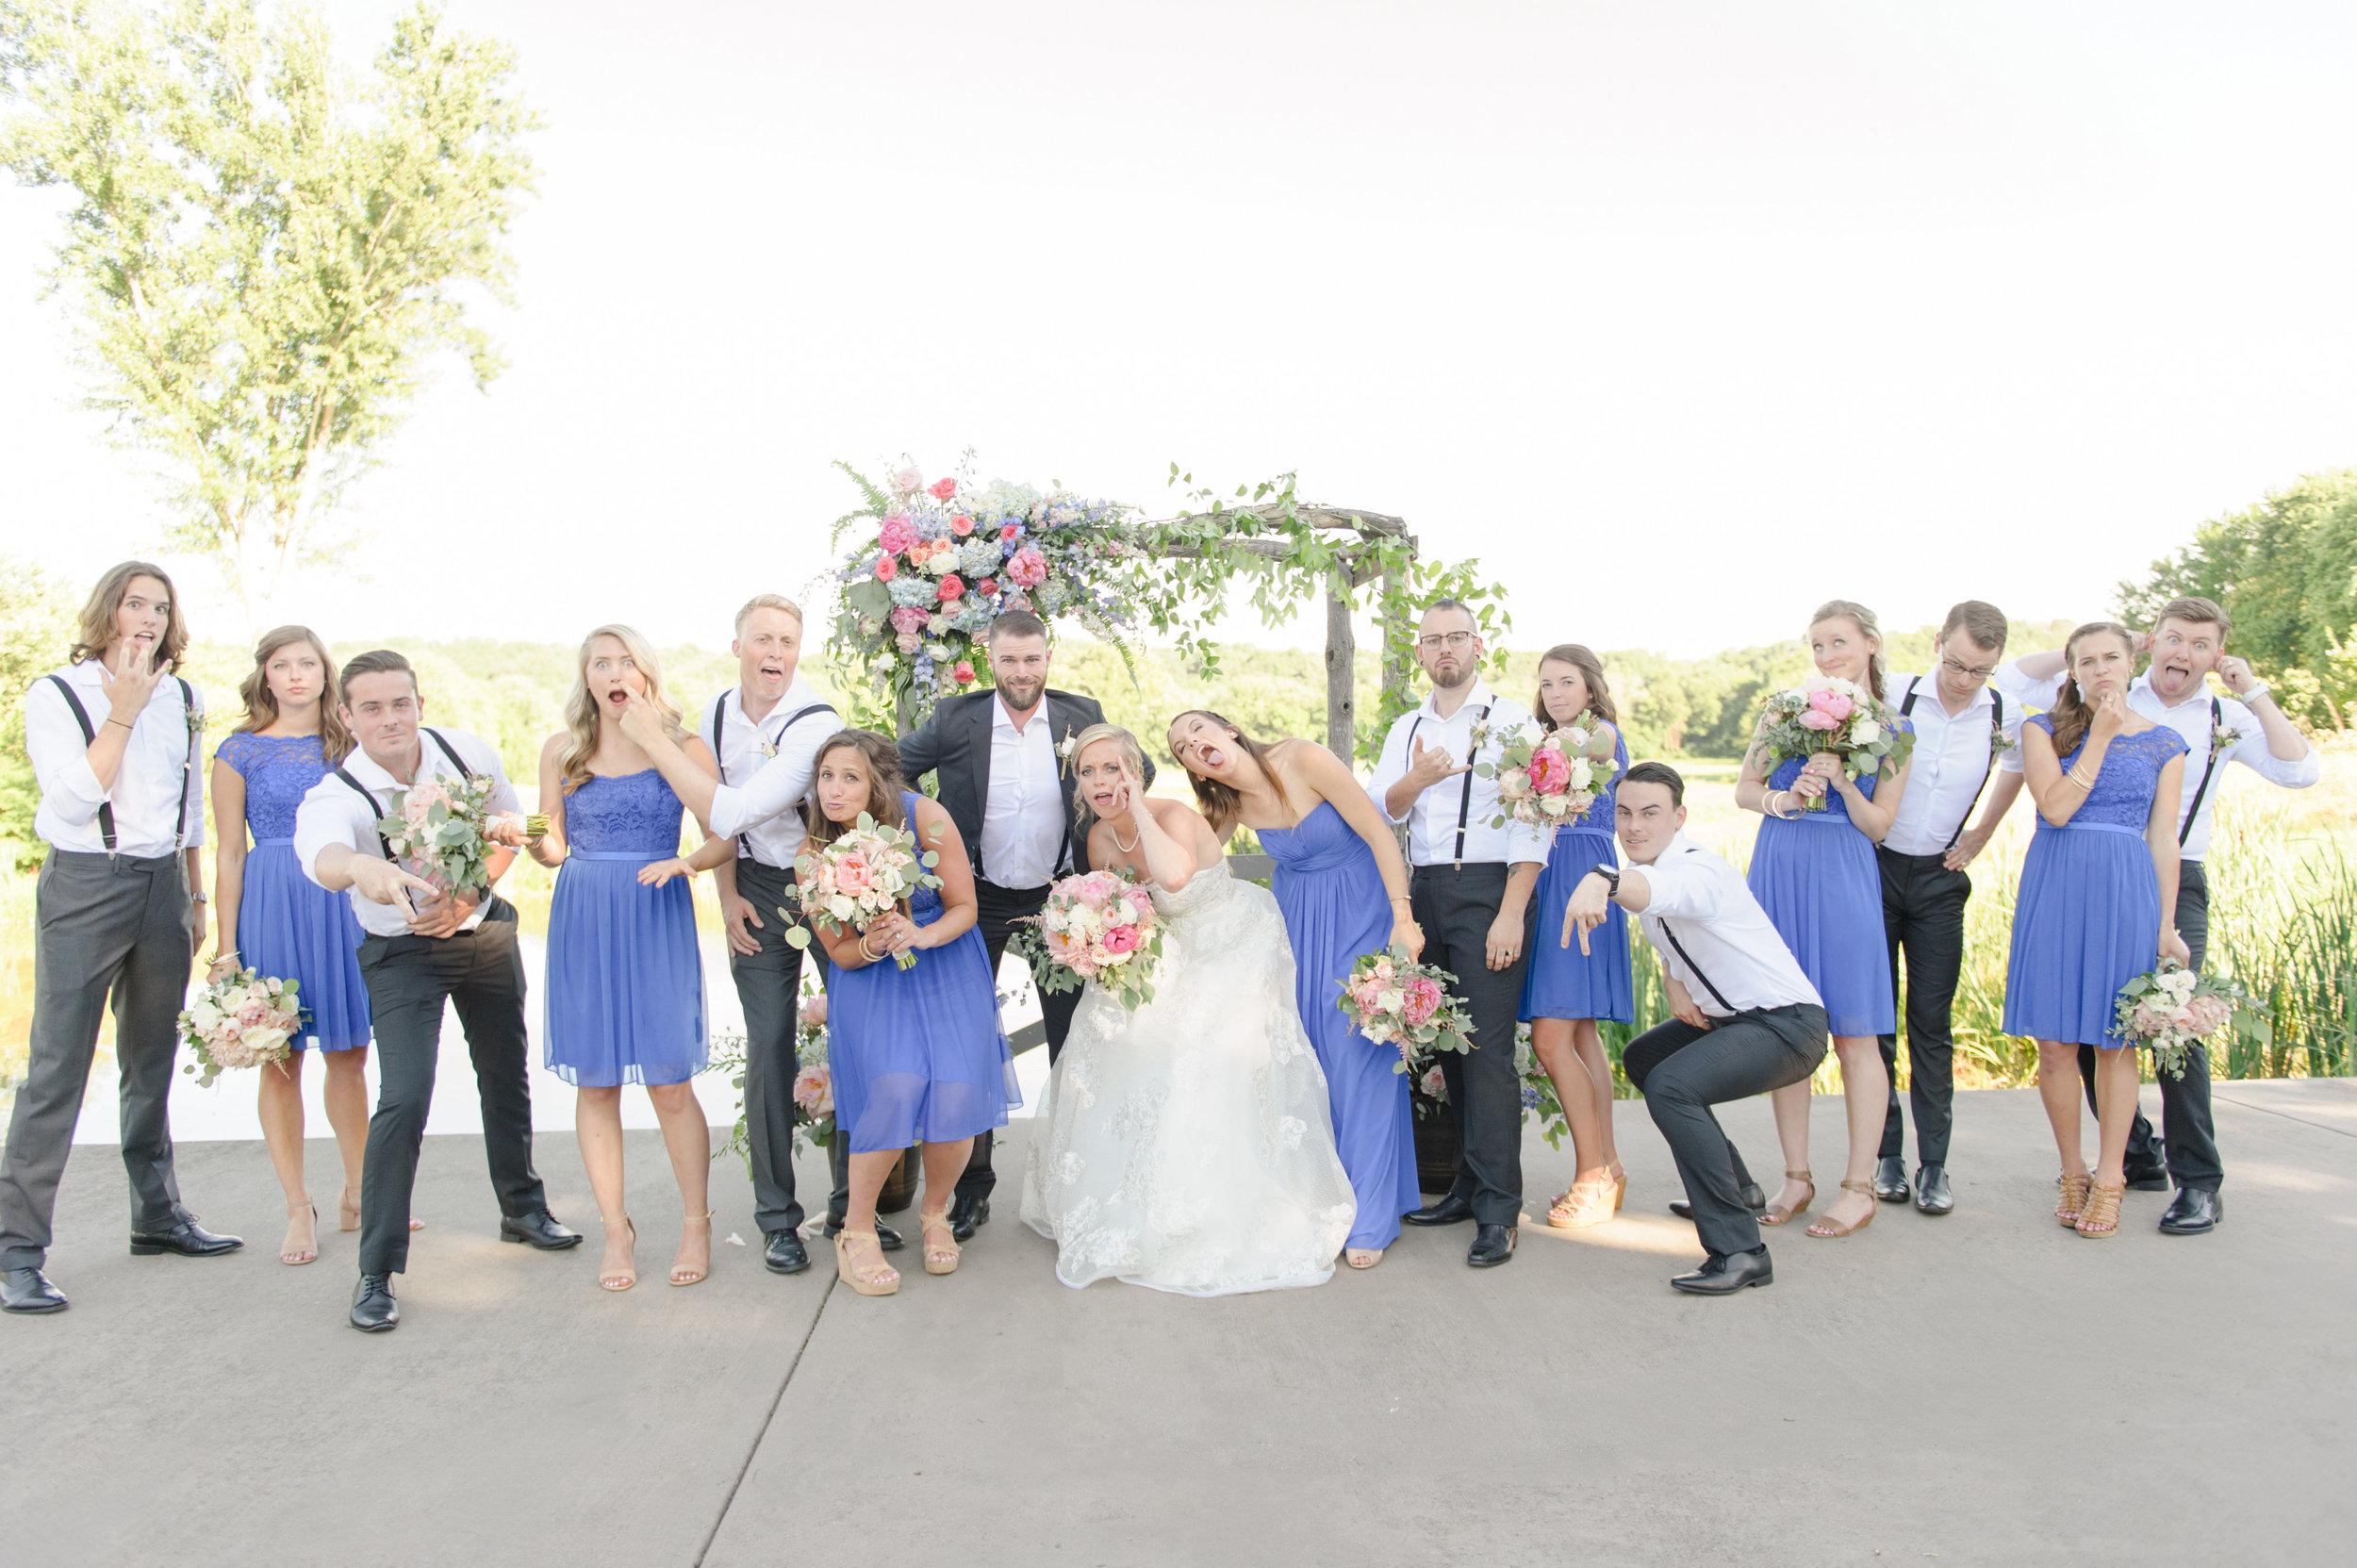 Shane Kelly Married-Bridal Party Portraits-0075.jpg